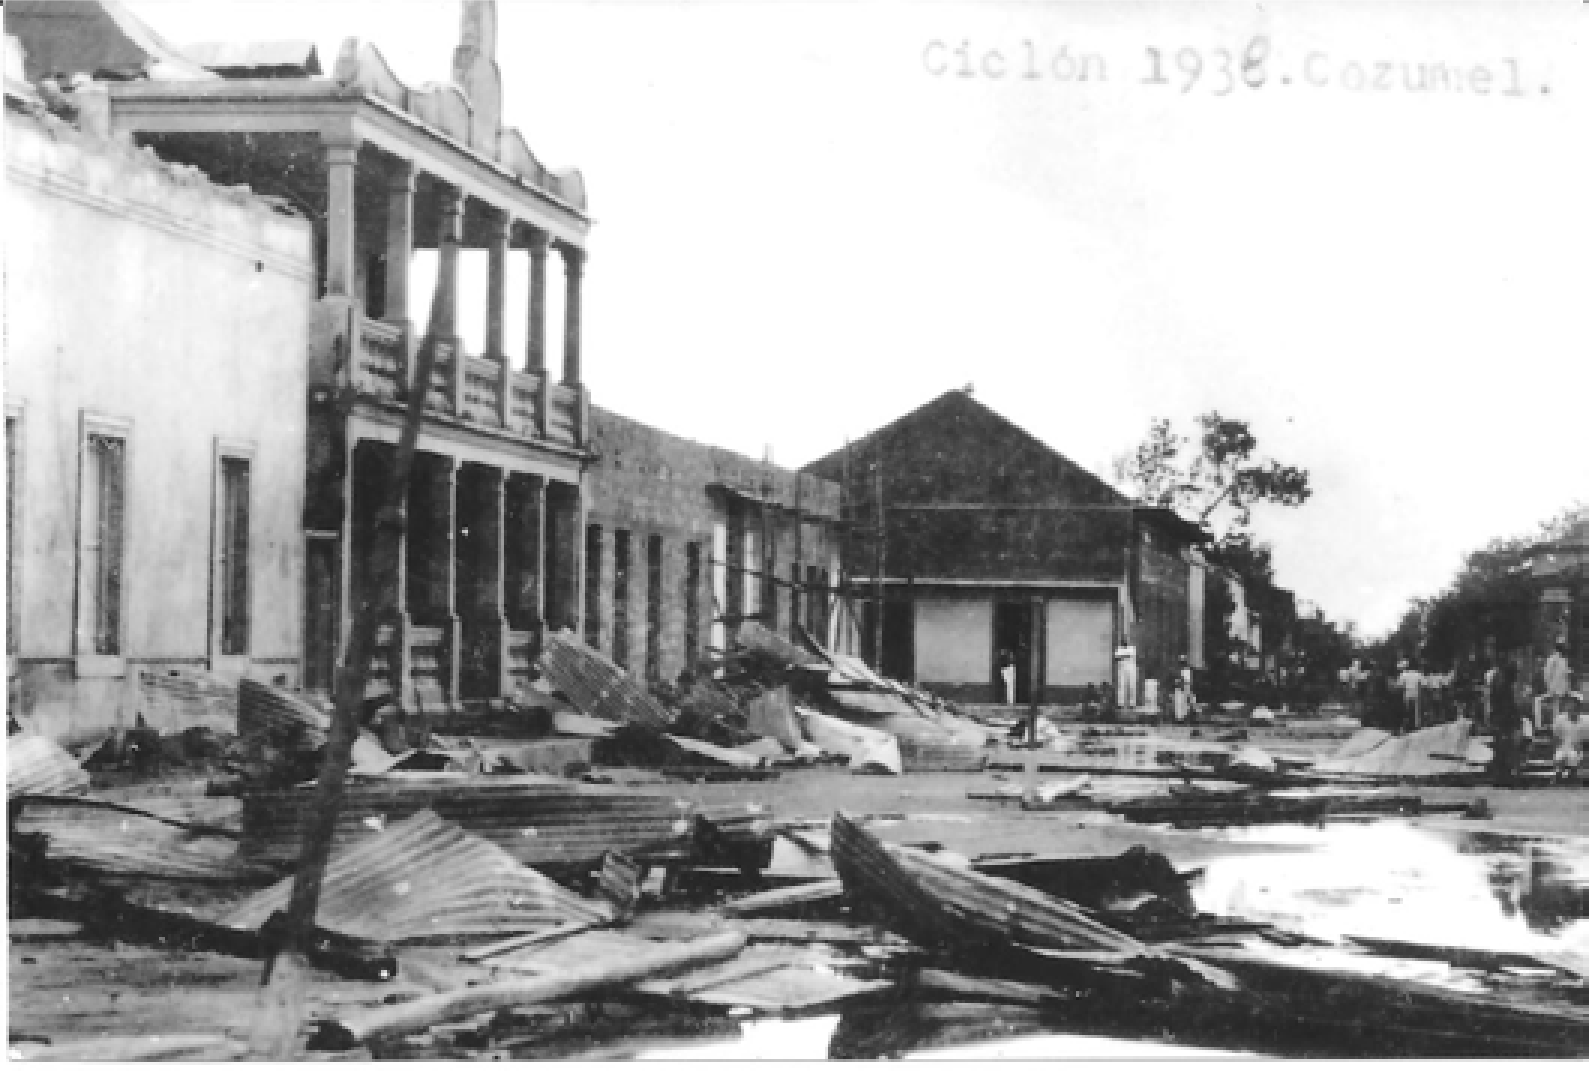 devastación por huracan en 1938 en Cozumel